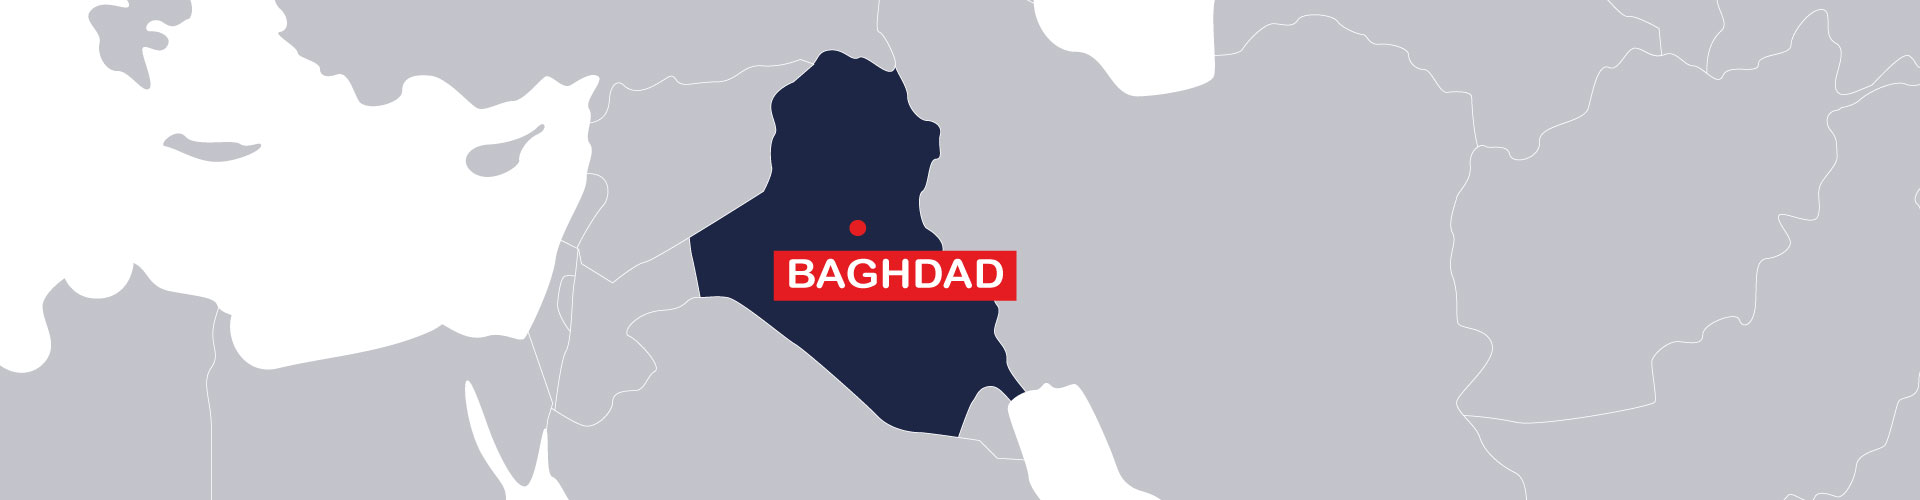 MAP IRAQ EN.jpg